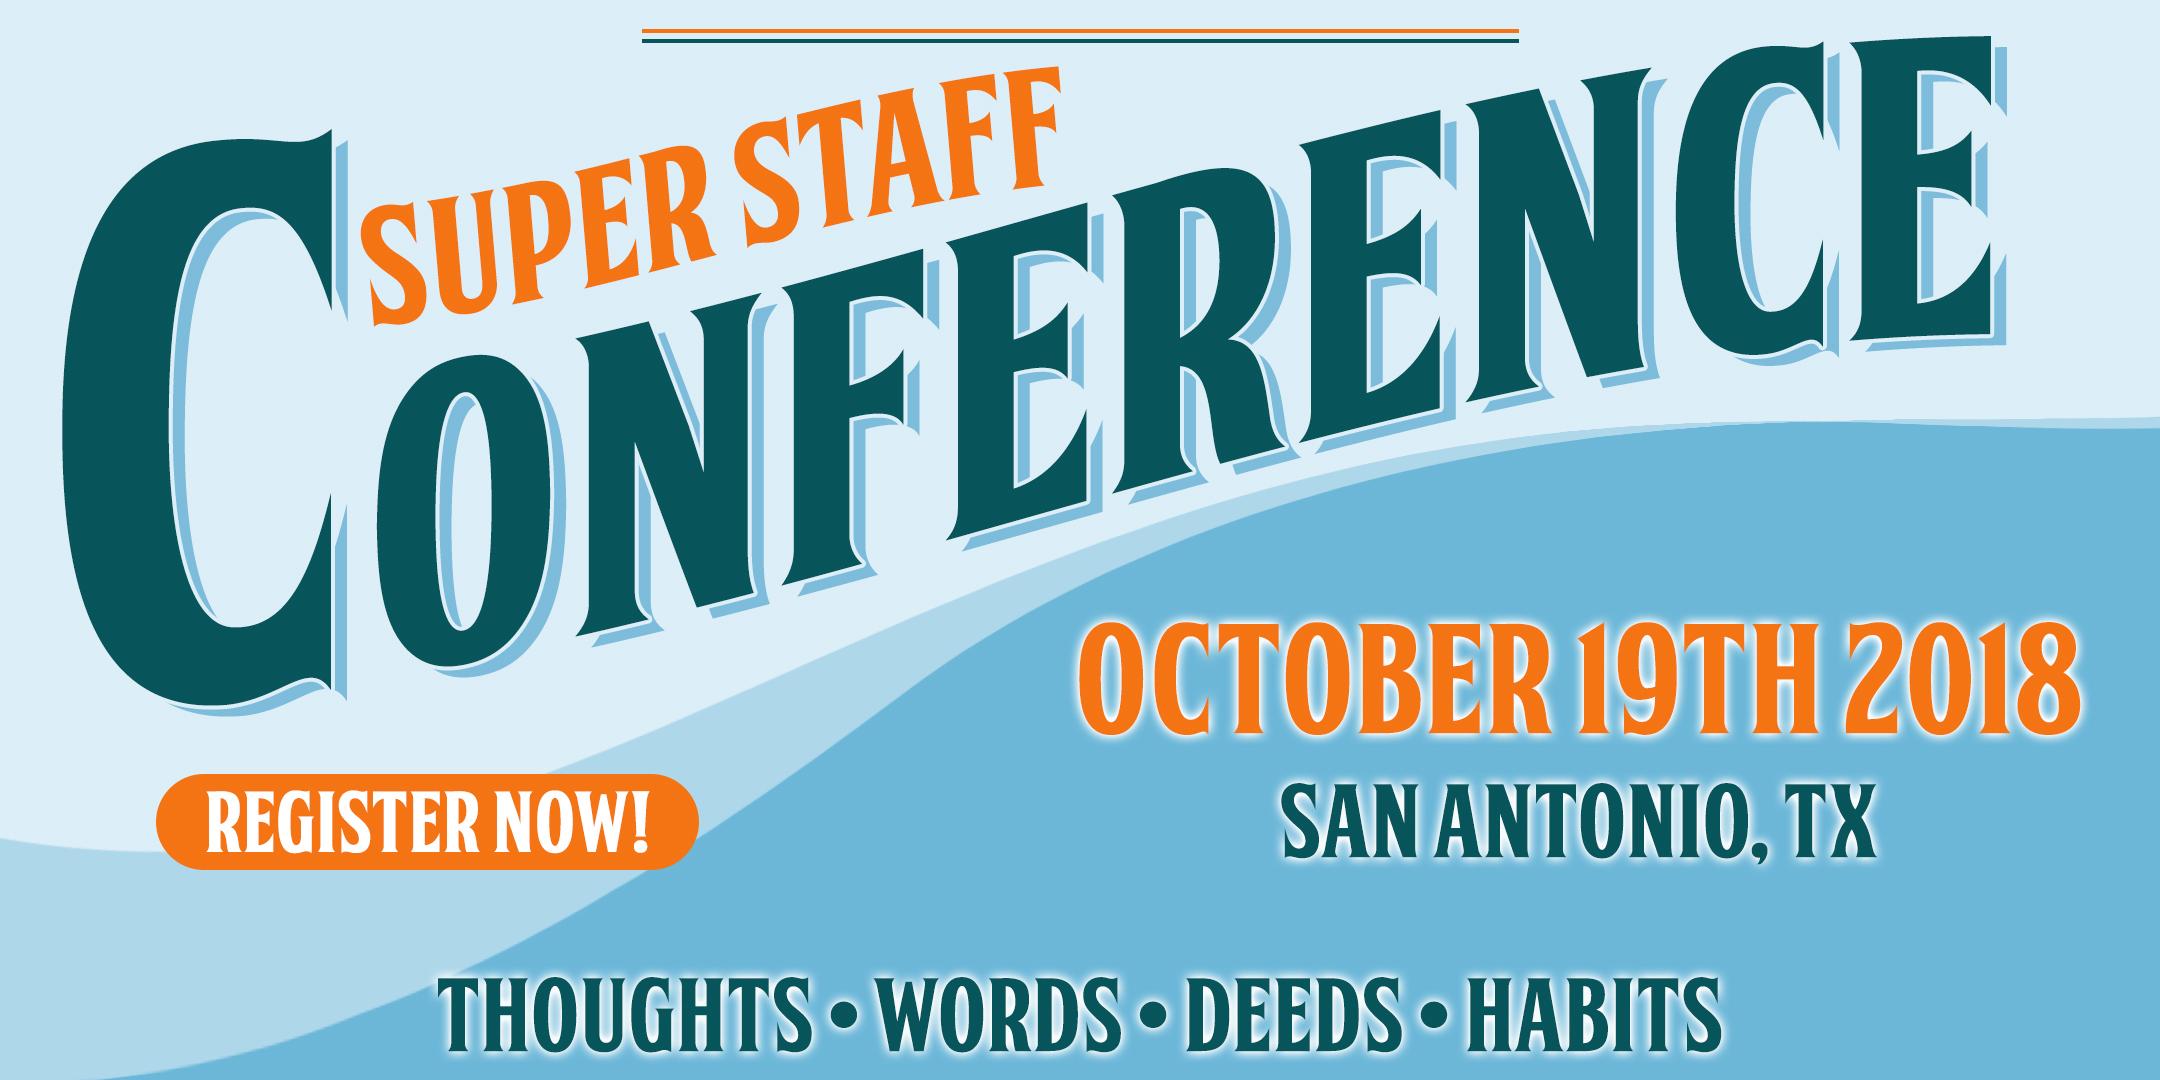 Super Staff Conference 2018 – Dentist Secure